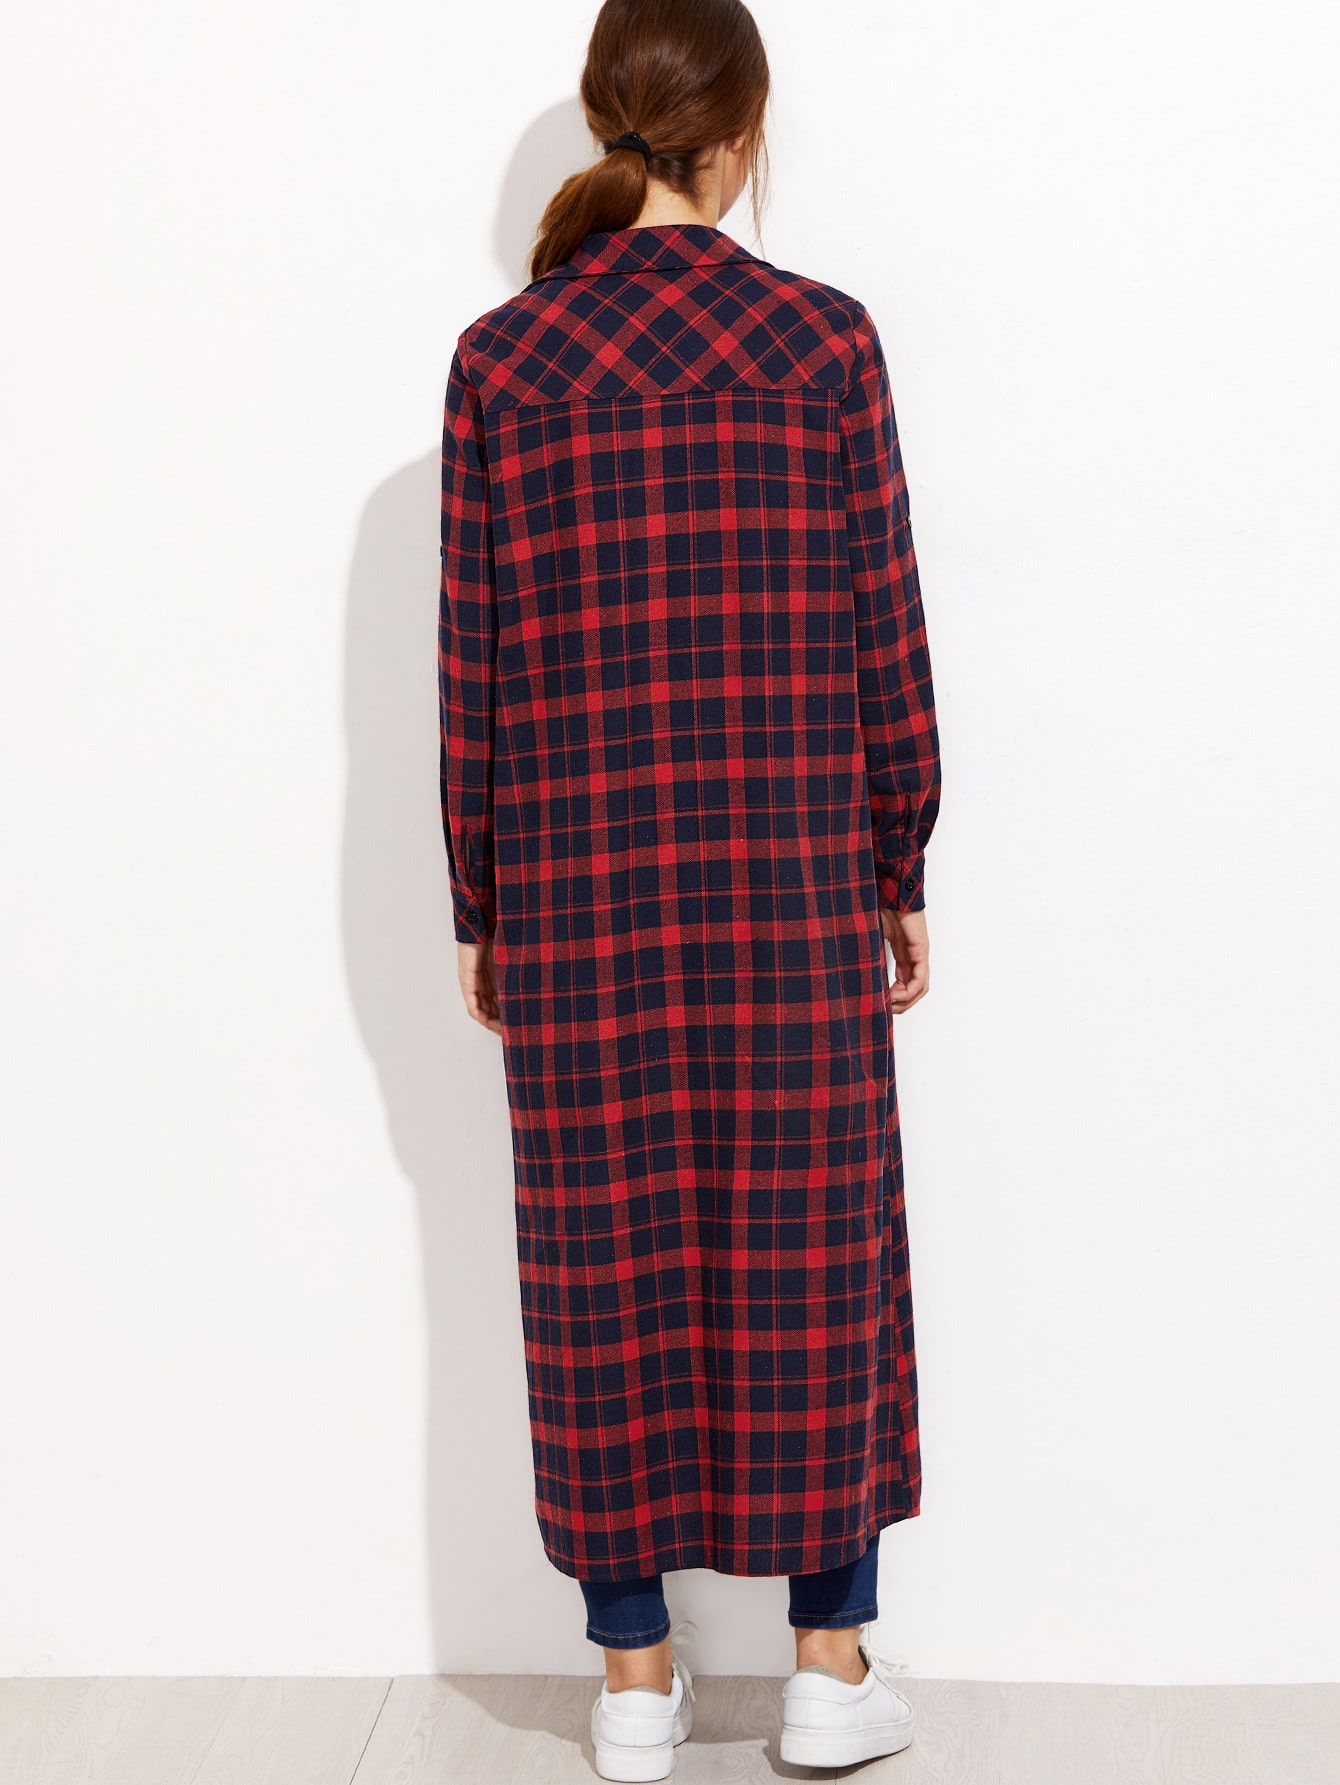 blouse en tartan avec poche bleu marine et rouge french shein sheinside. Black Bedroom Furniture Sets. Home Design Ideas